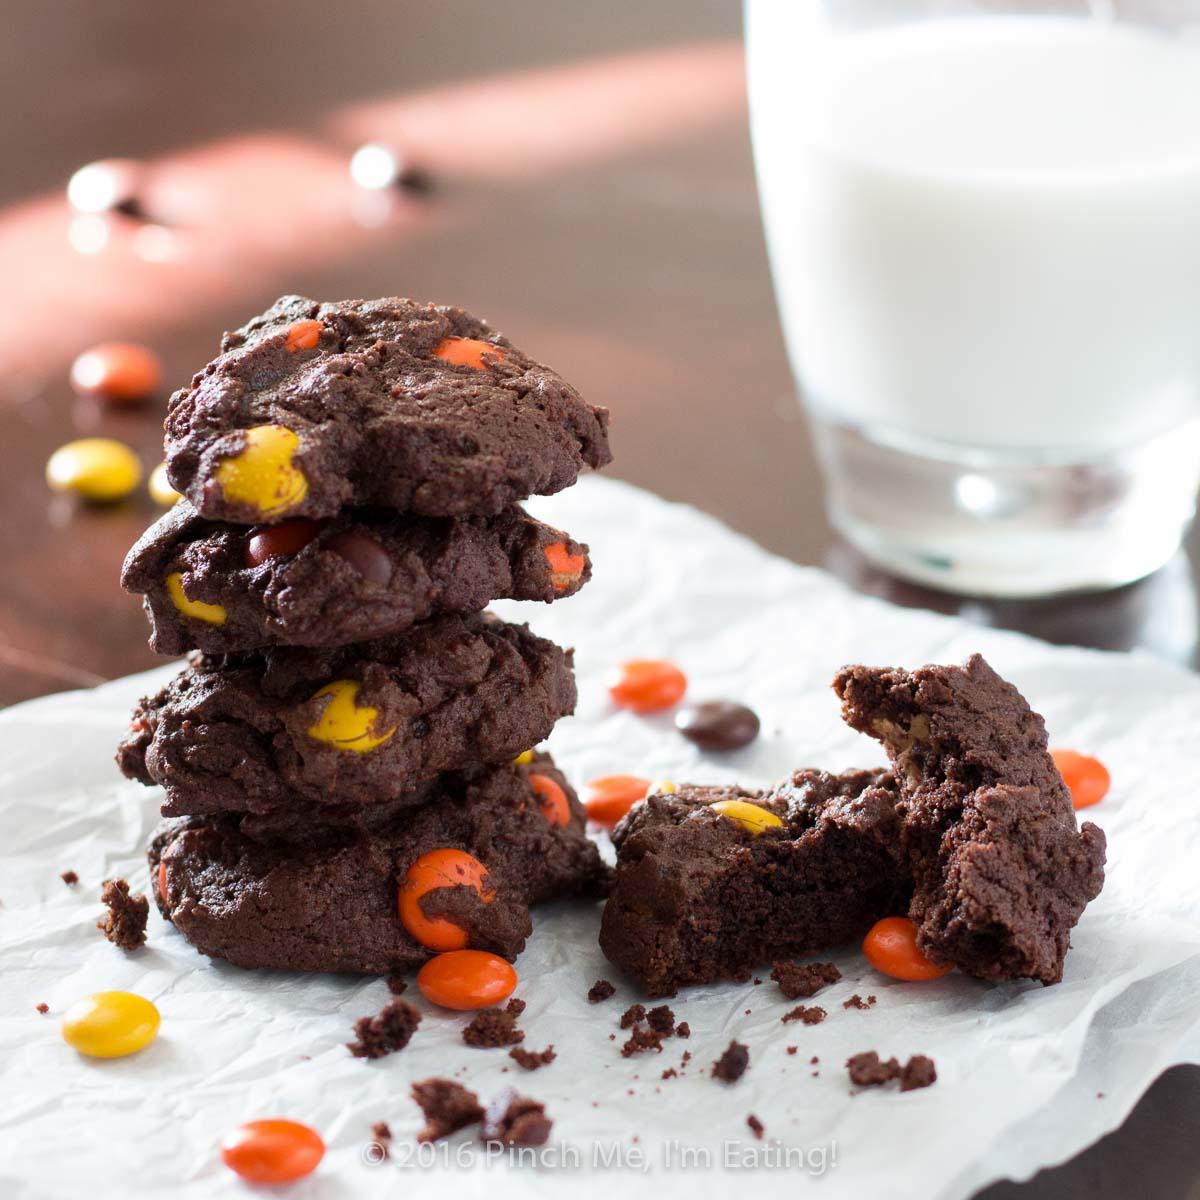 Festive Chocolate Reese's Cookies